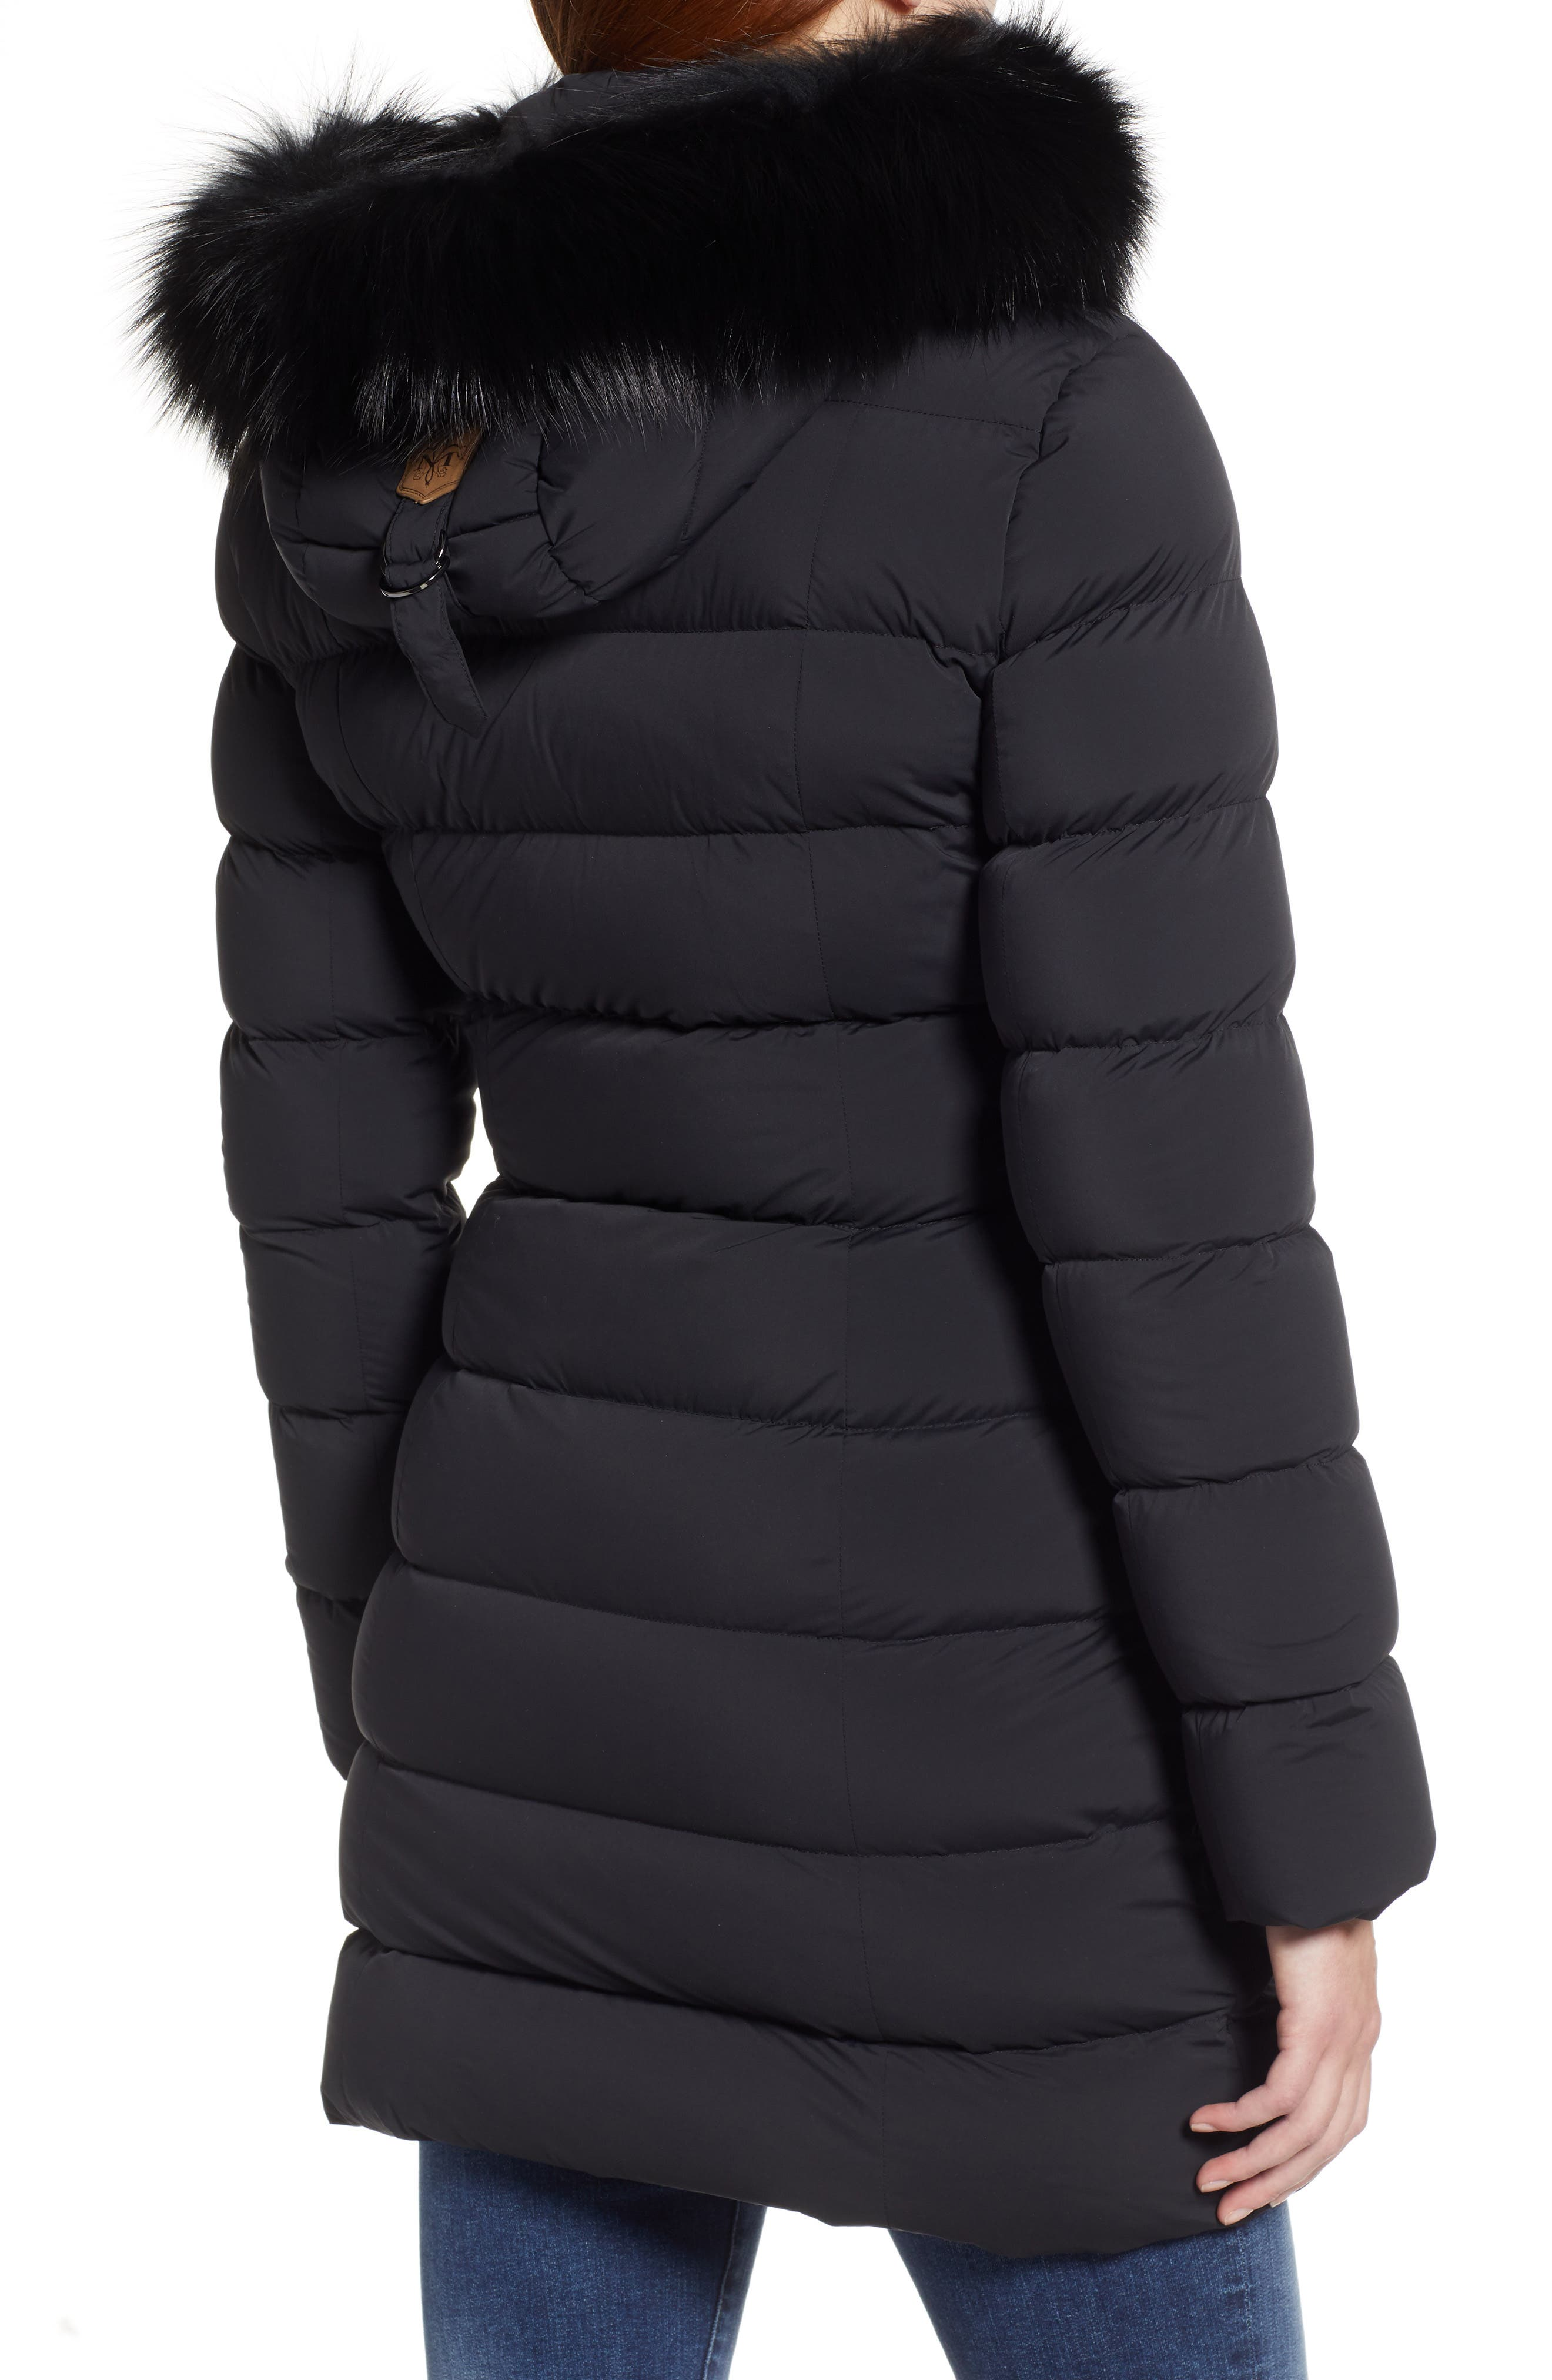 MACKAGE, Calla Genuine Fox Fur Trim Hooded Down Coat, Alternate thumbnail 2, color, BLACK